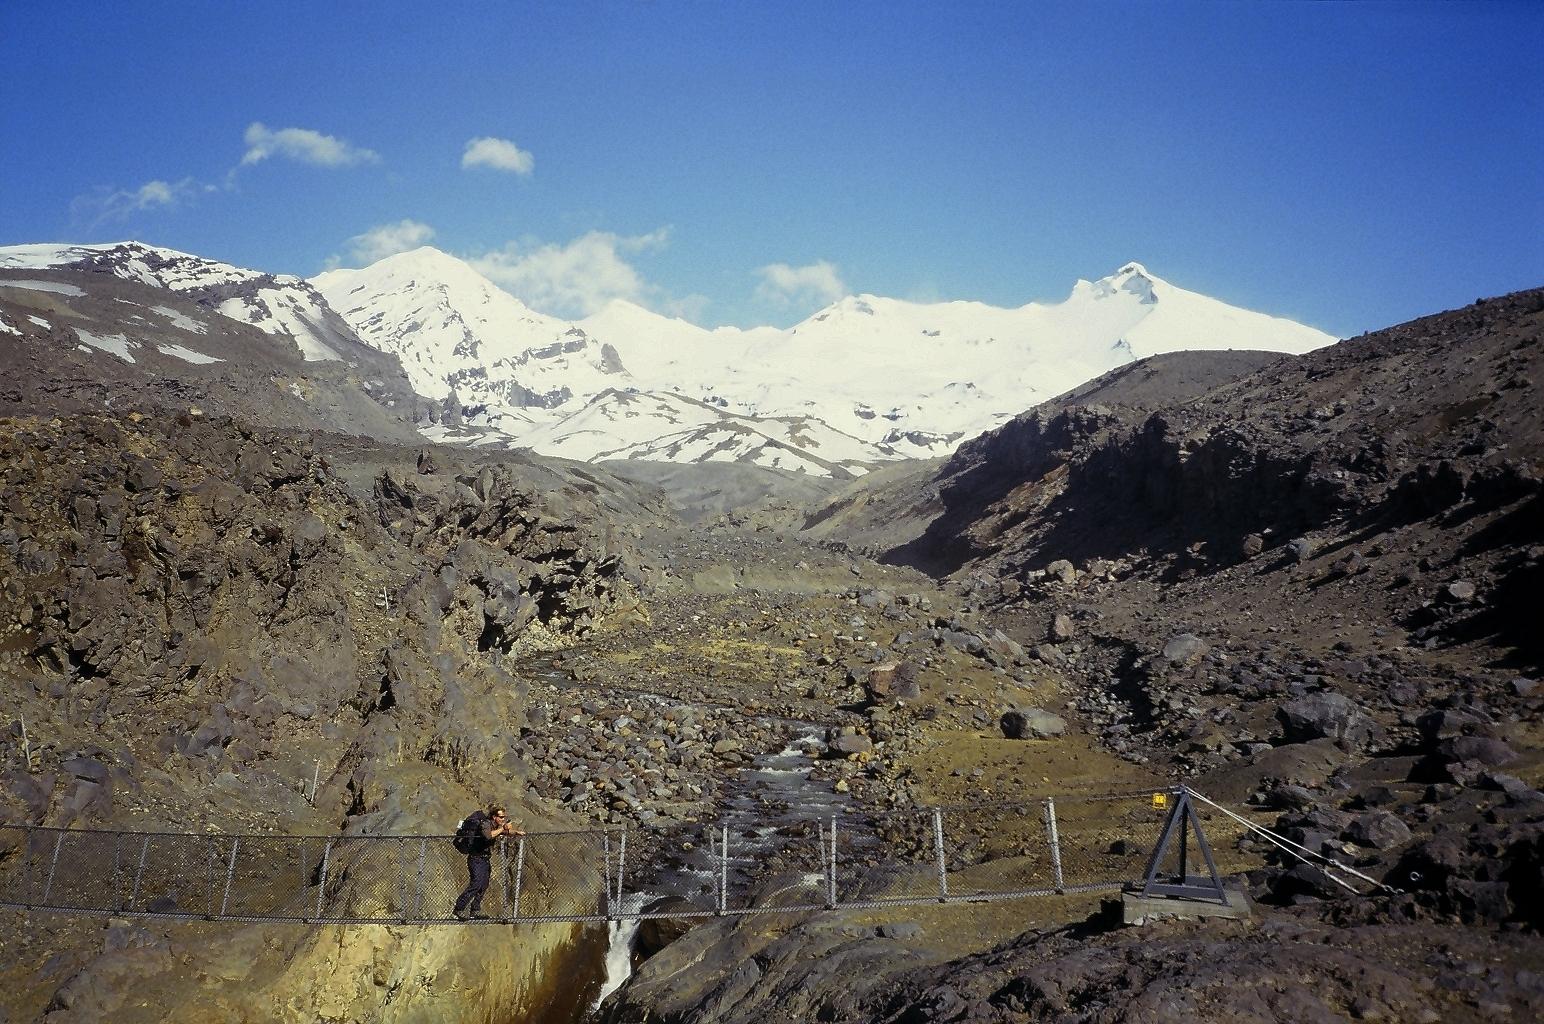 Crossing a lahar gully beneath Mount Ruapehu